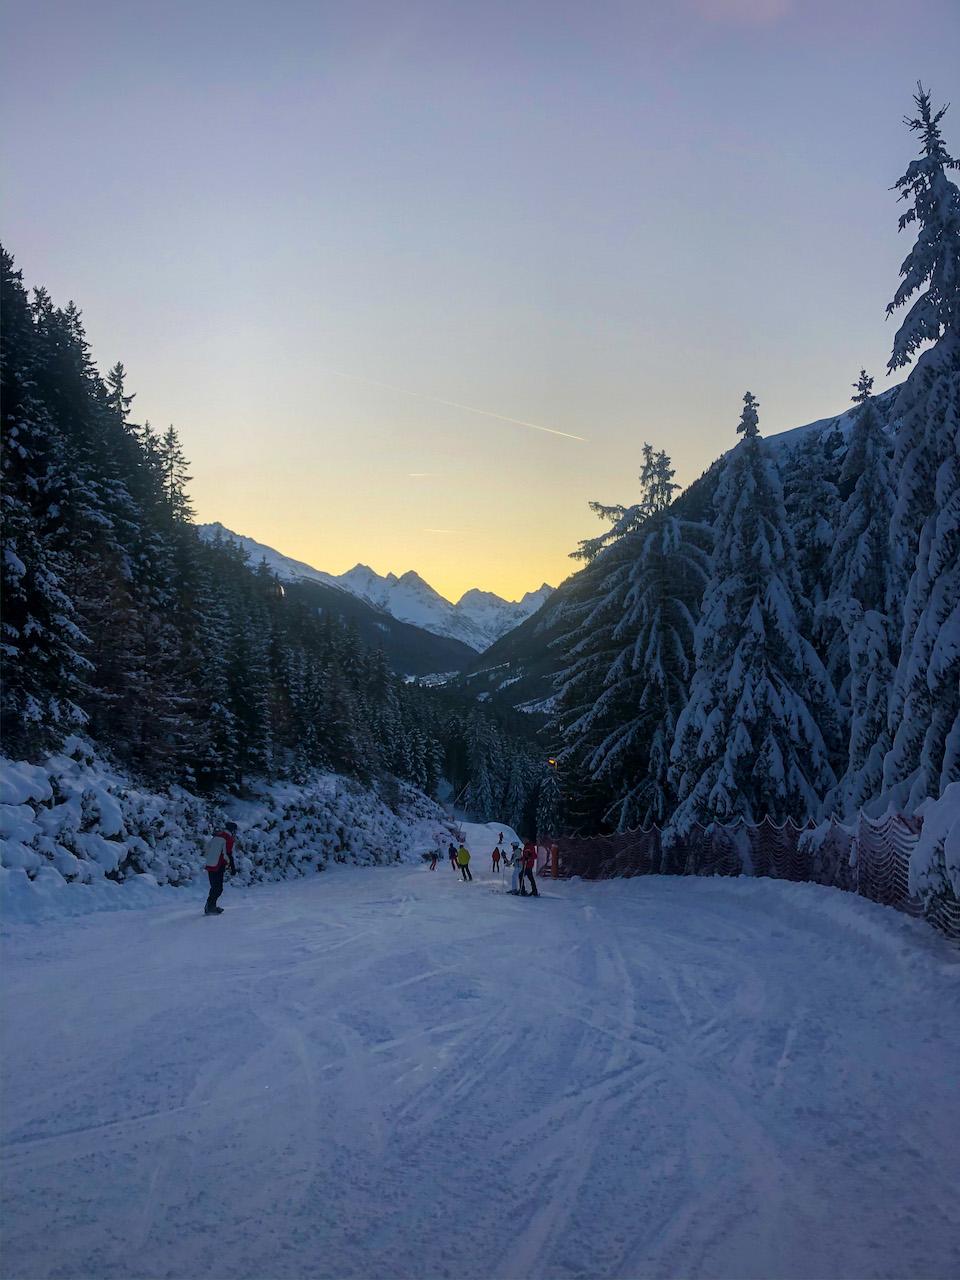 Ischgl ski - wintersport tips - Samnaun - skimap Ischgl - Schhmugglerrunden/ Smuggler's circuits - dalafdaling vanaf apres-ski naar dorp Ischgl